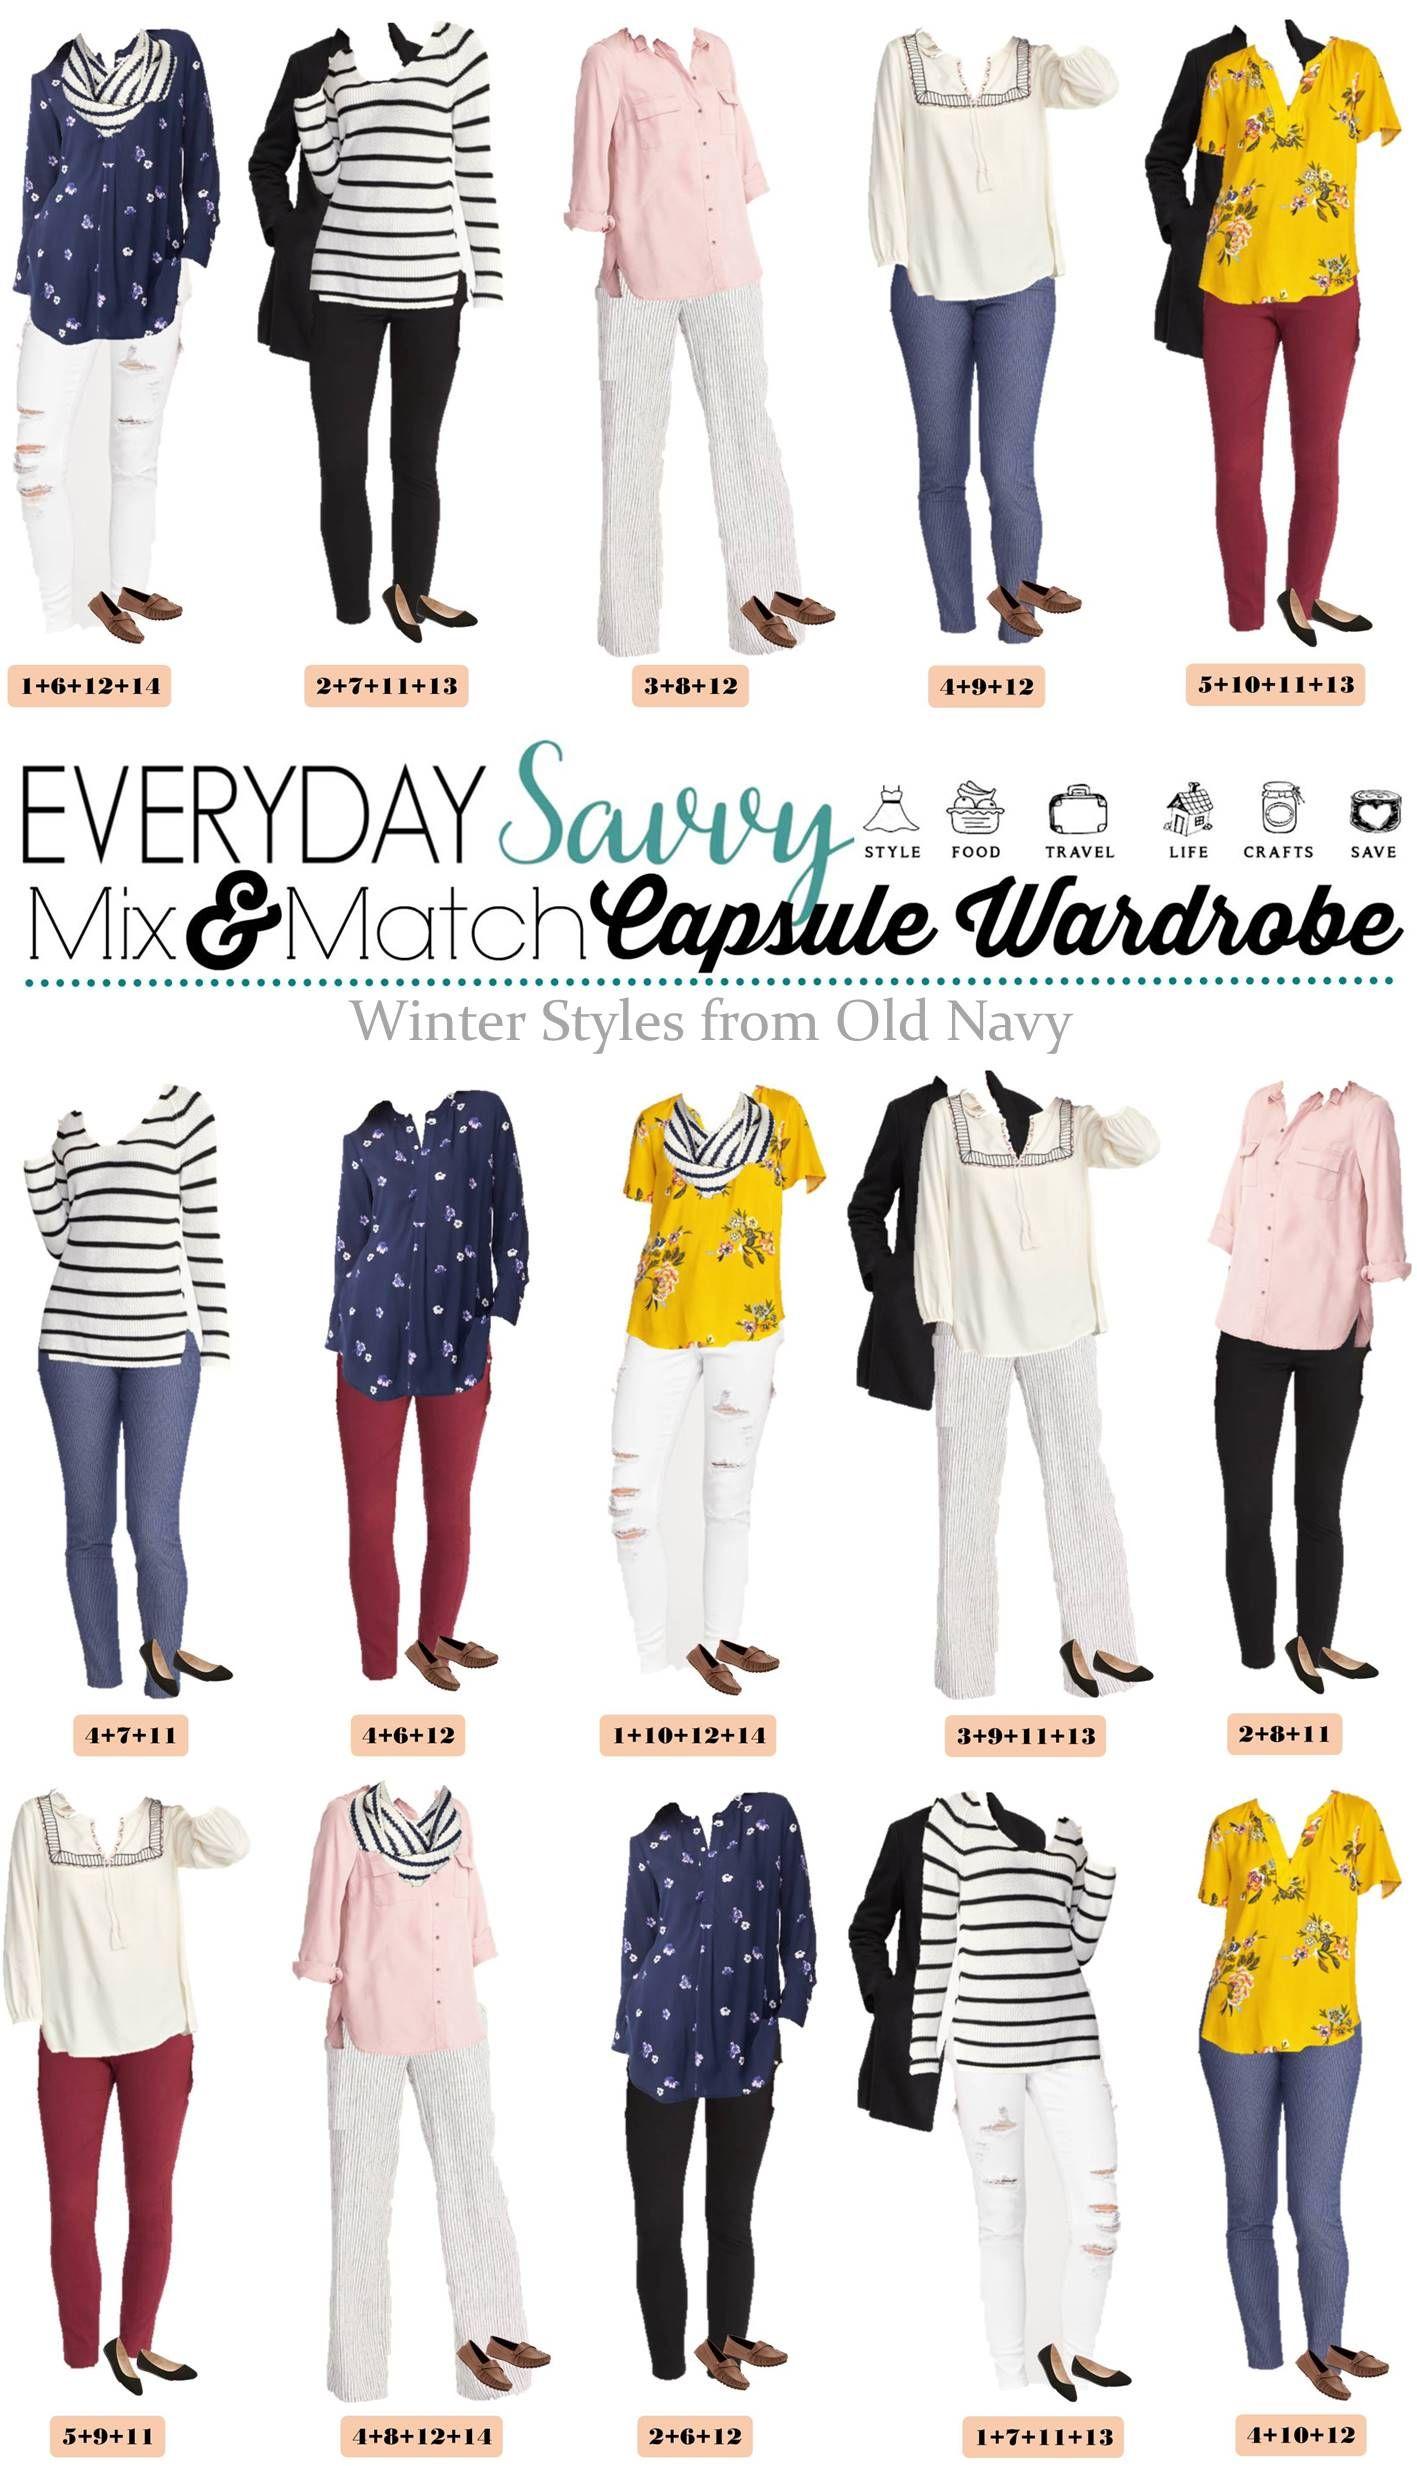 Spring Capsule Wardrobe: Old Navy Winter To Spring Outfits Capsule Wardrobe